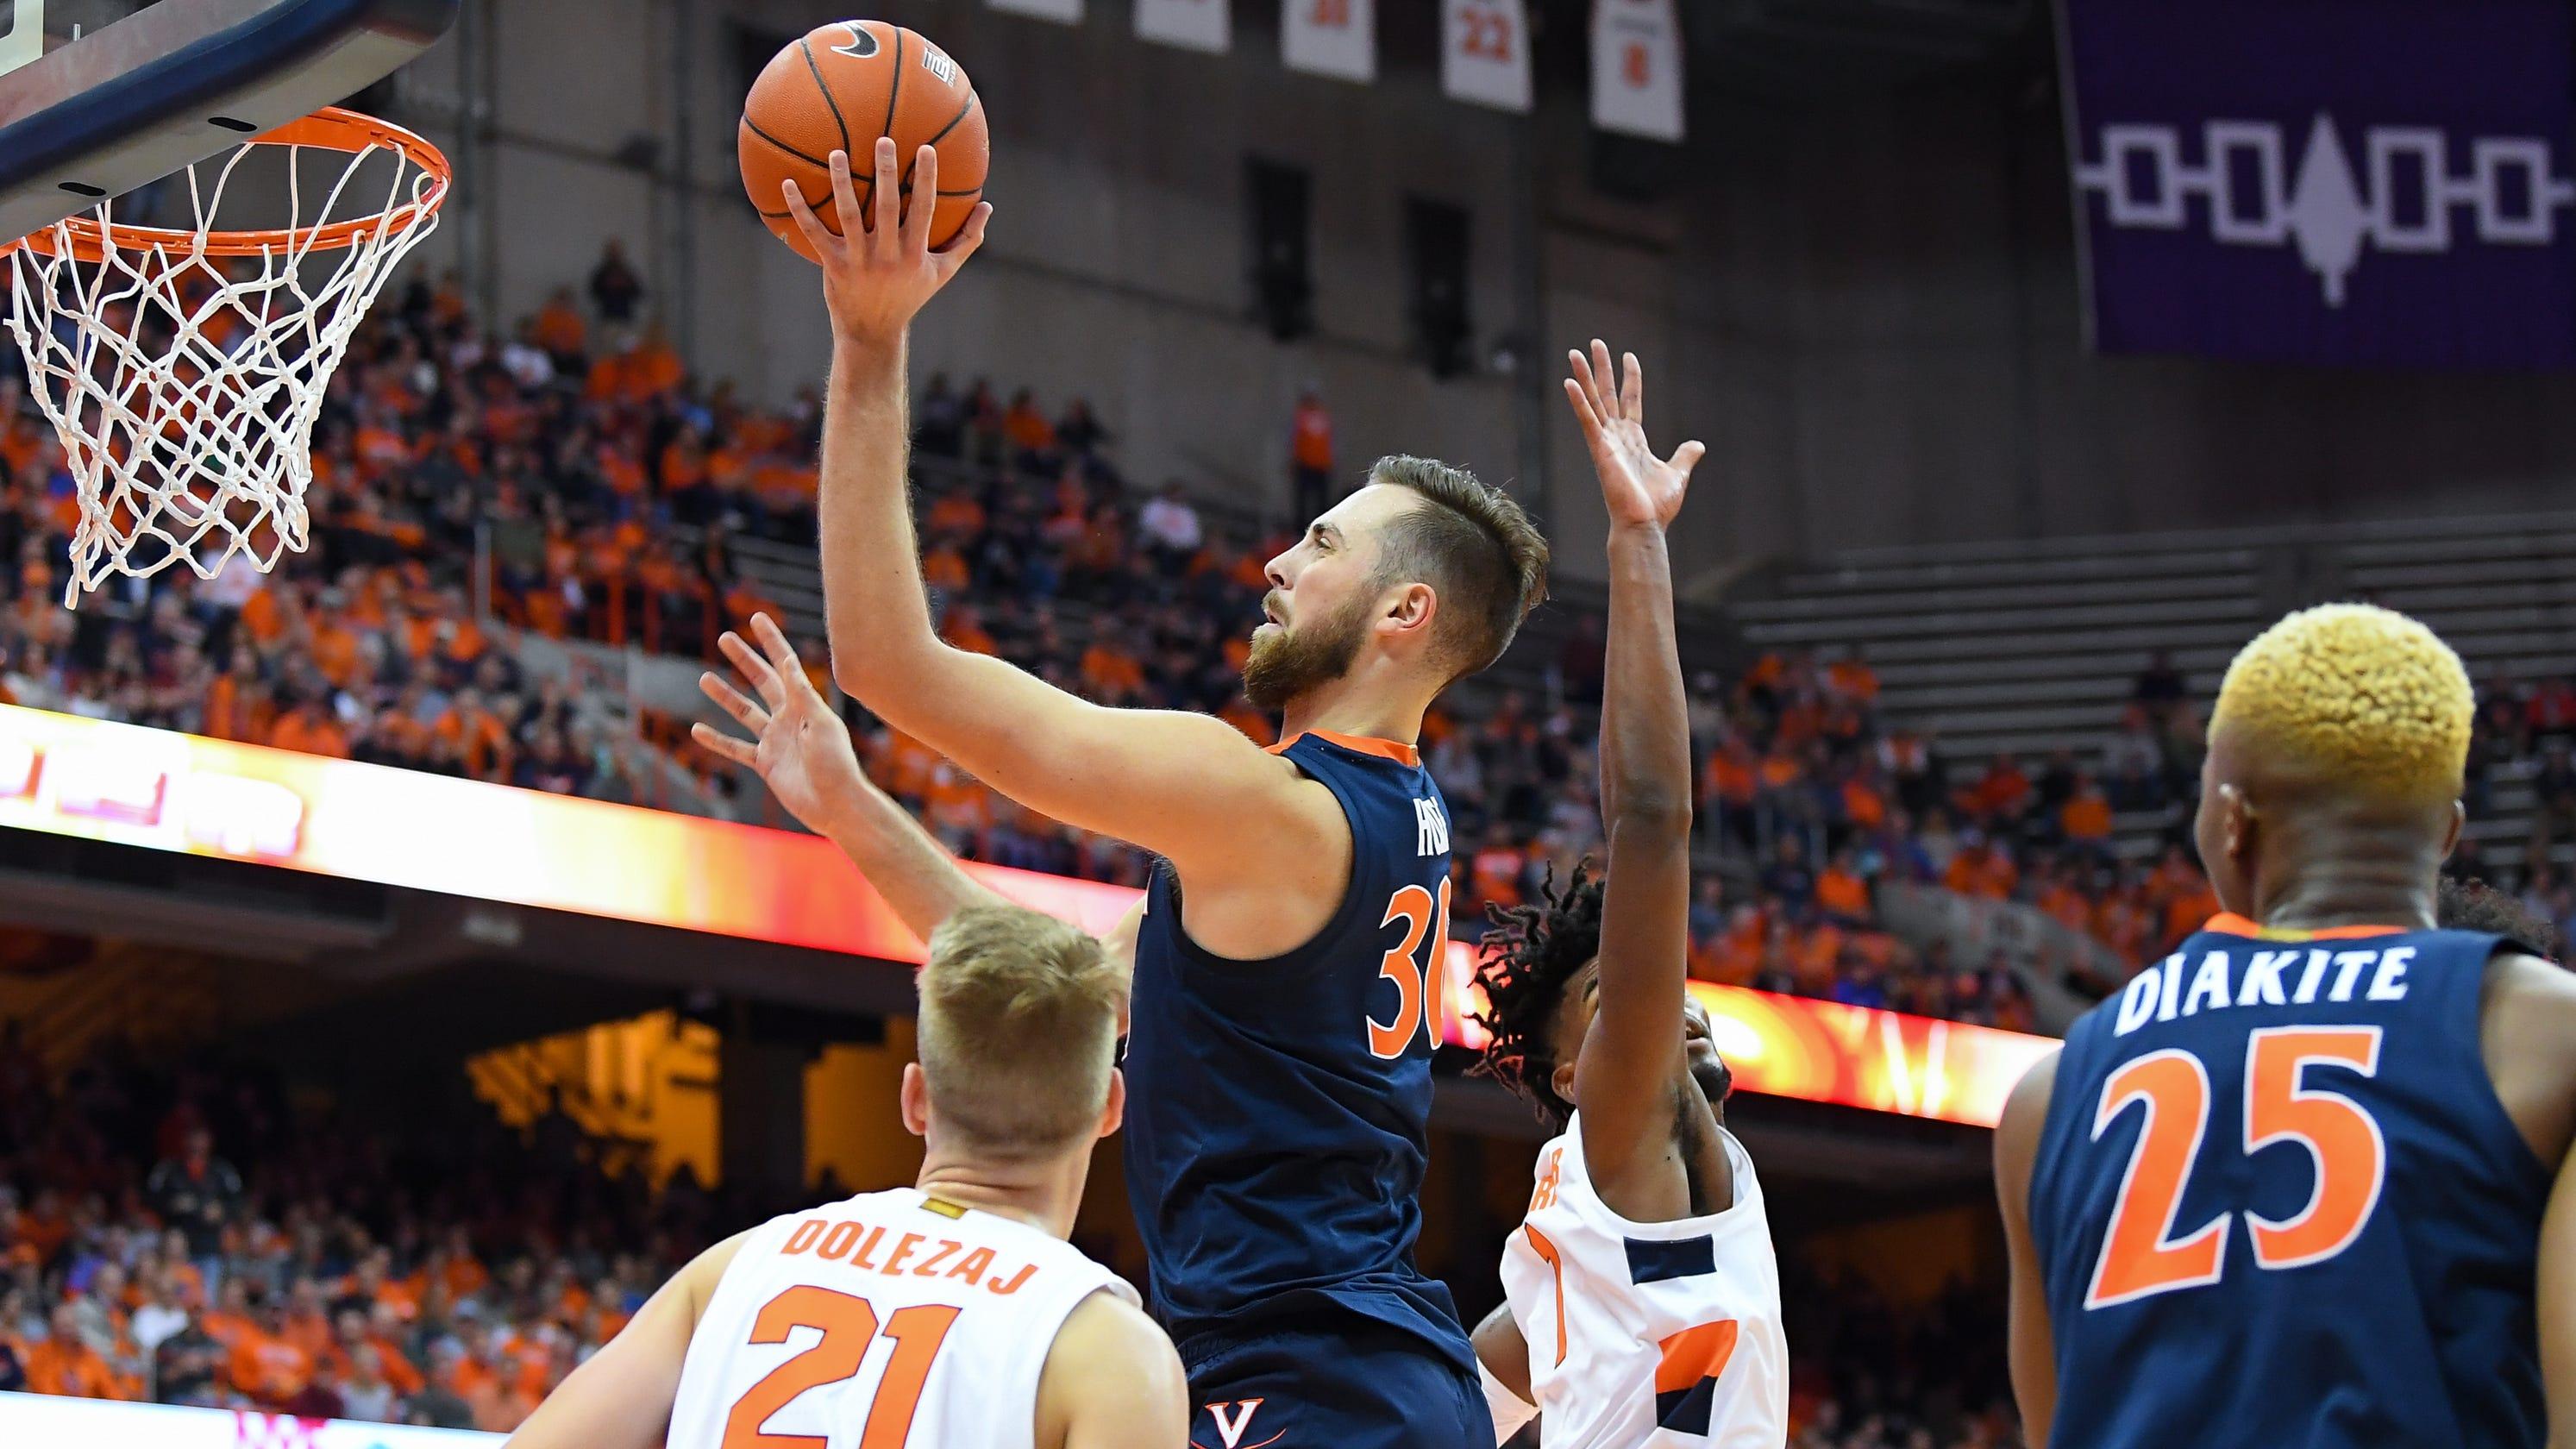 College Basketball Virginia Dominates Inside While Handling